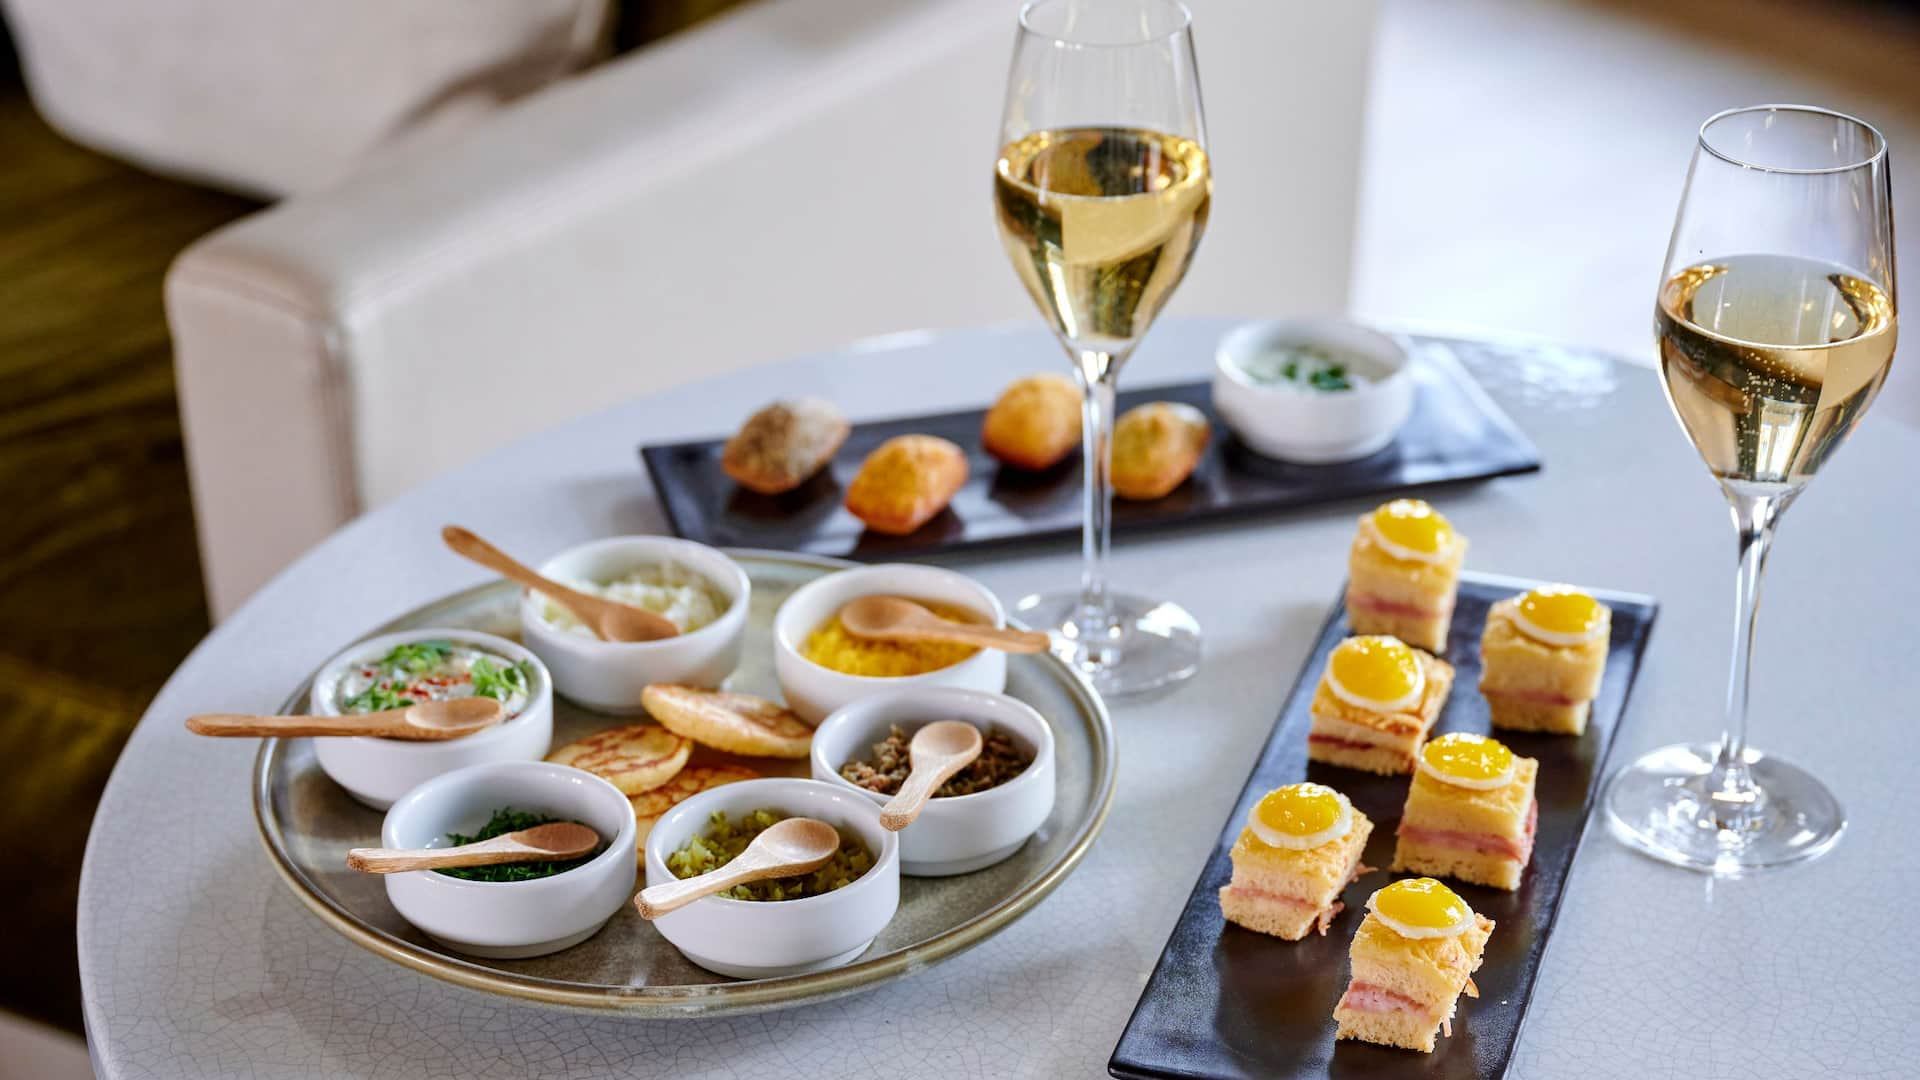 Parisian Apero Appetizers at Hotel Hyatt Paris Madeleine